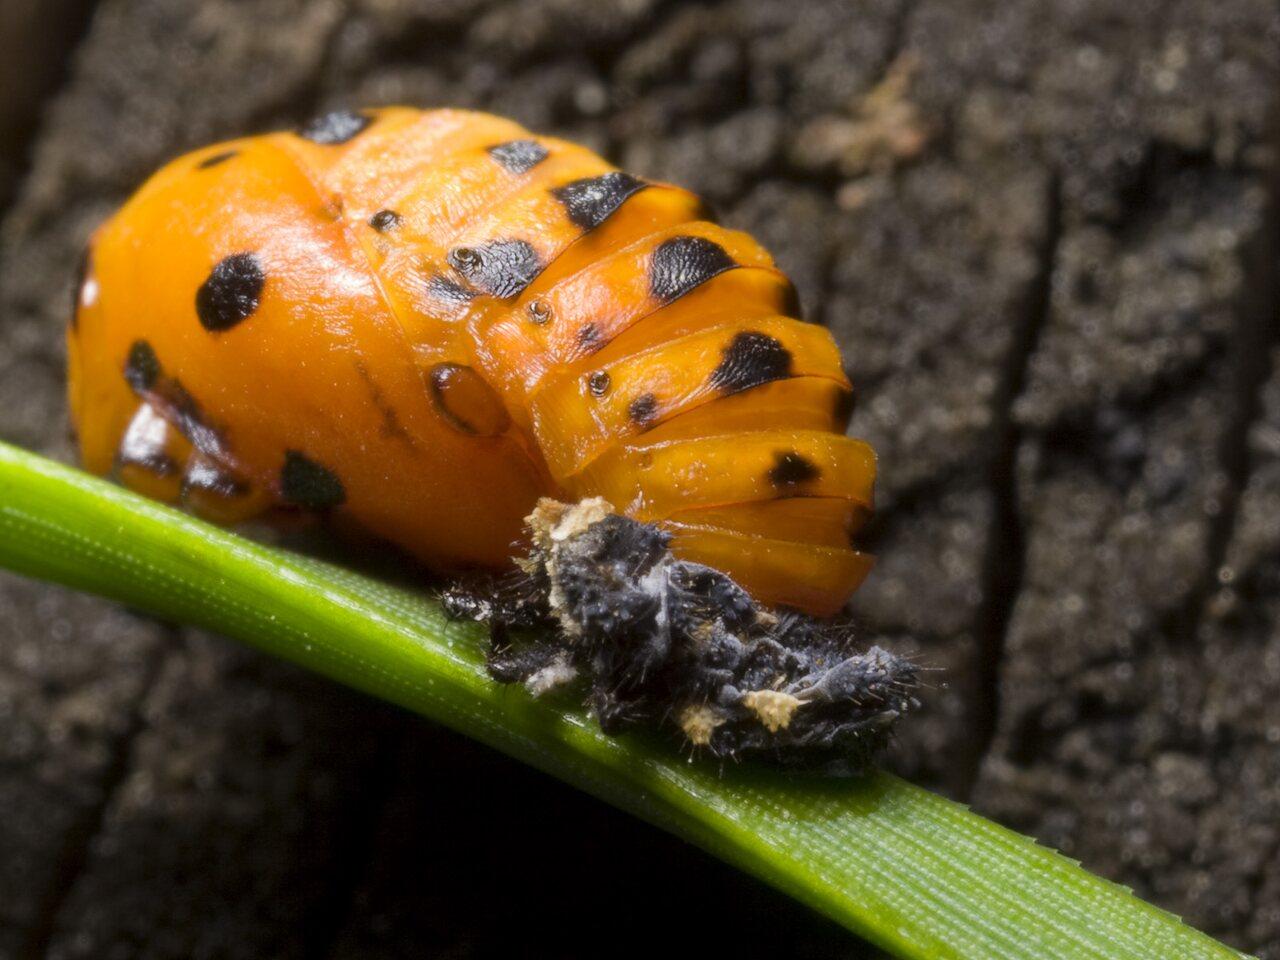 Coccinella-septempunctata-1089.jpg